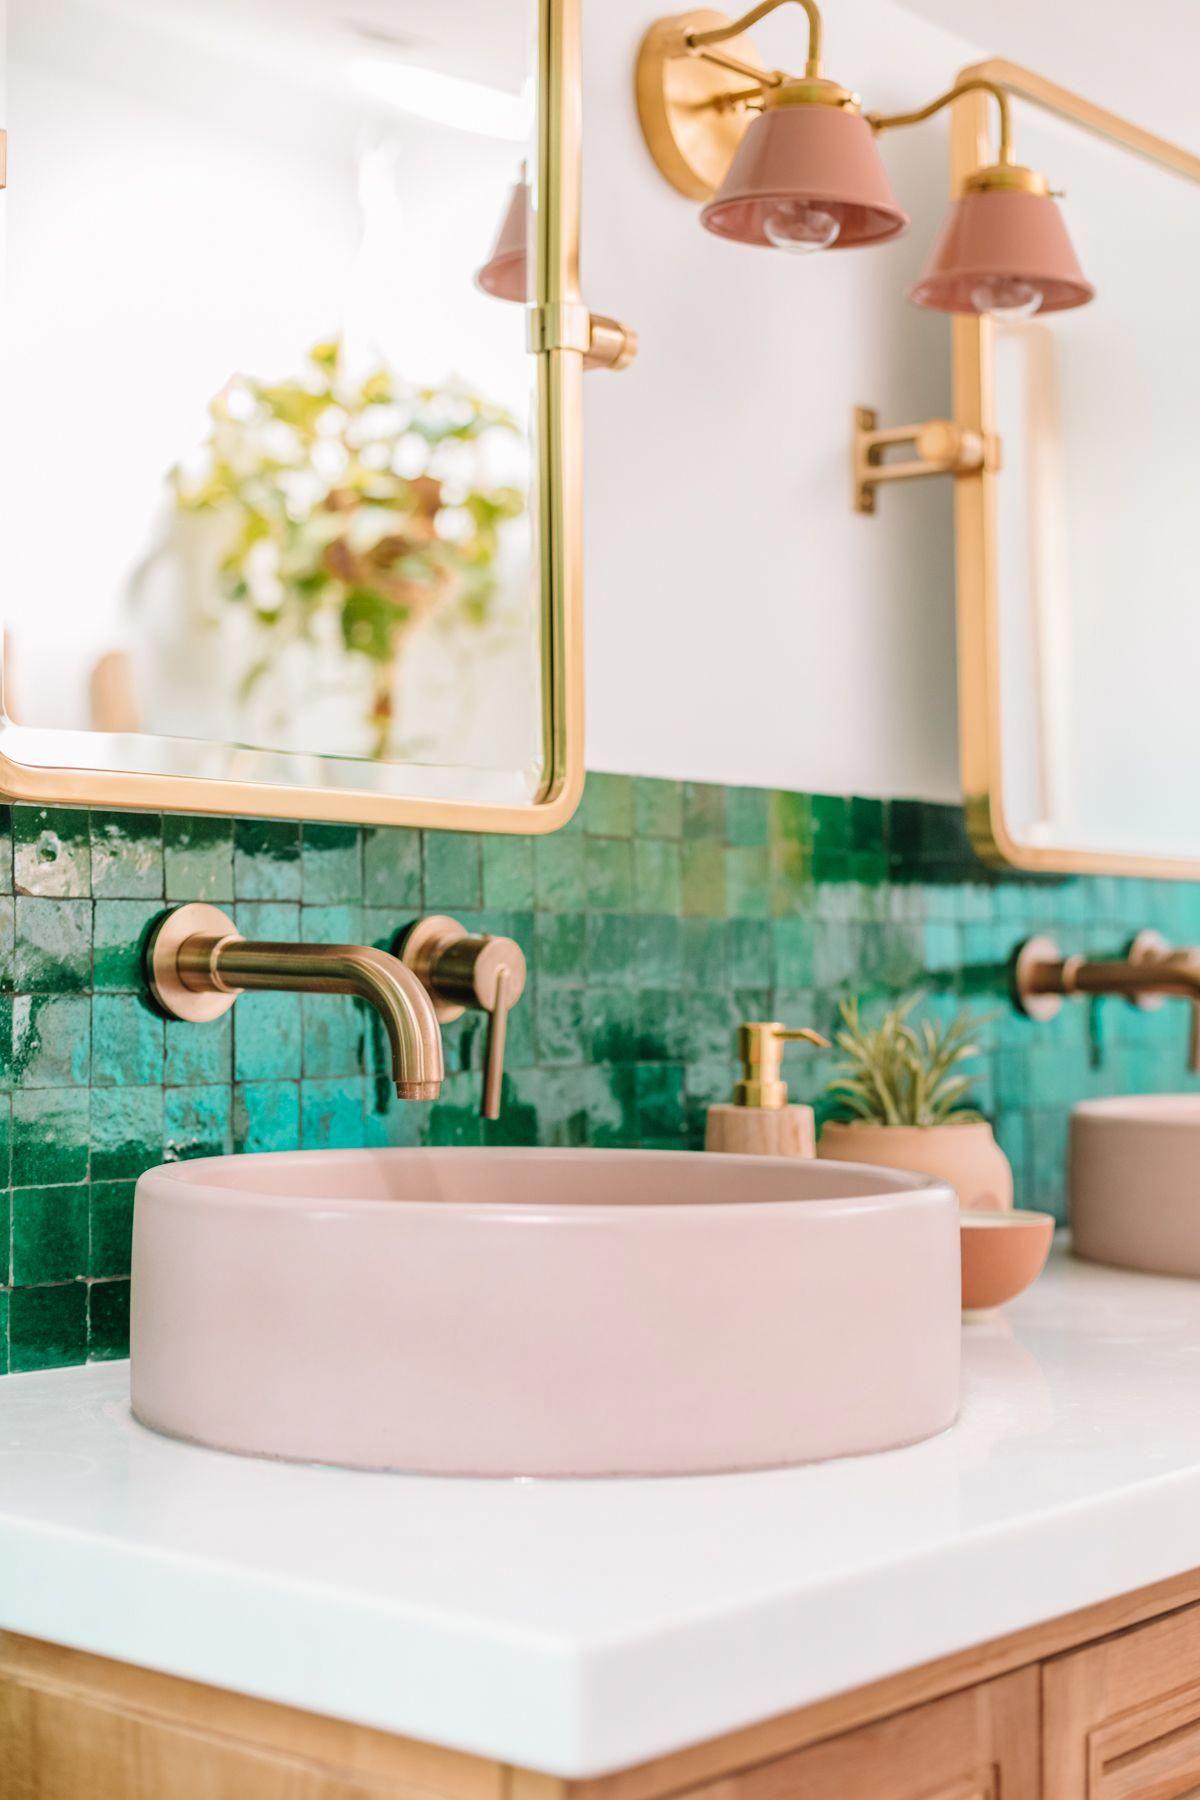 How to create a Zen bathroom? en 2020 | Azulejos verdes ...